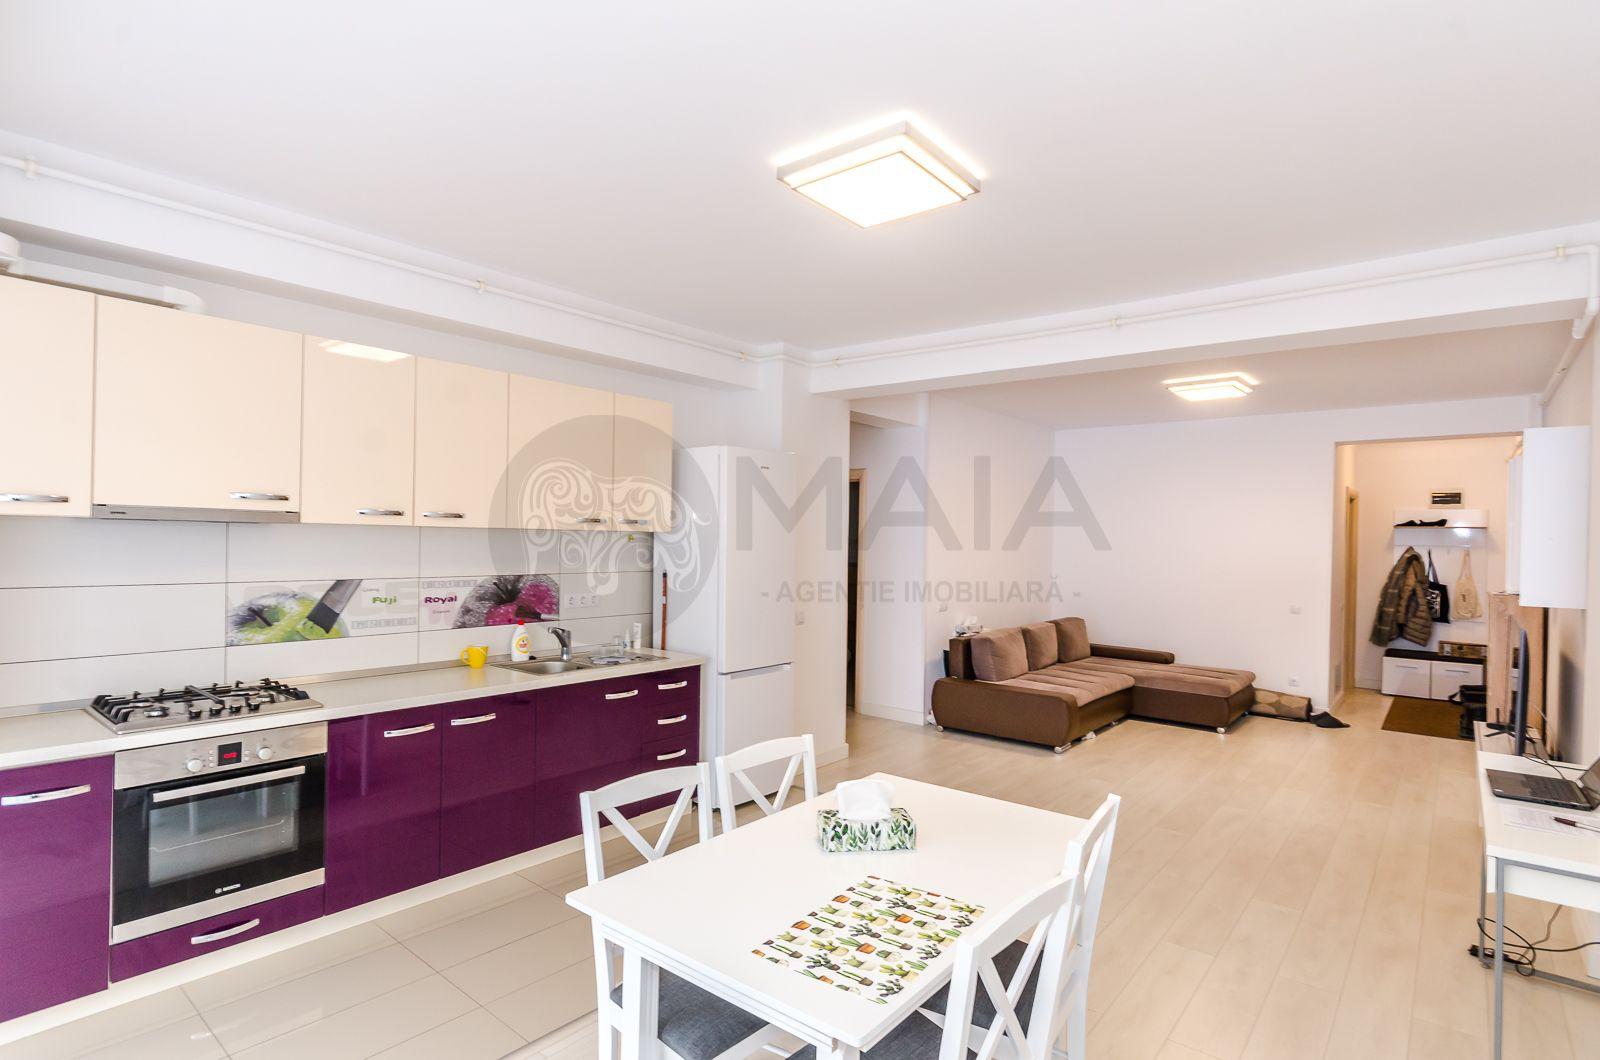 Apartament 3 camere, 2 bai, modern, lift, bloc nou, parcul Sub Arini